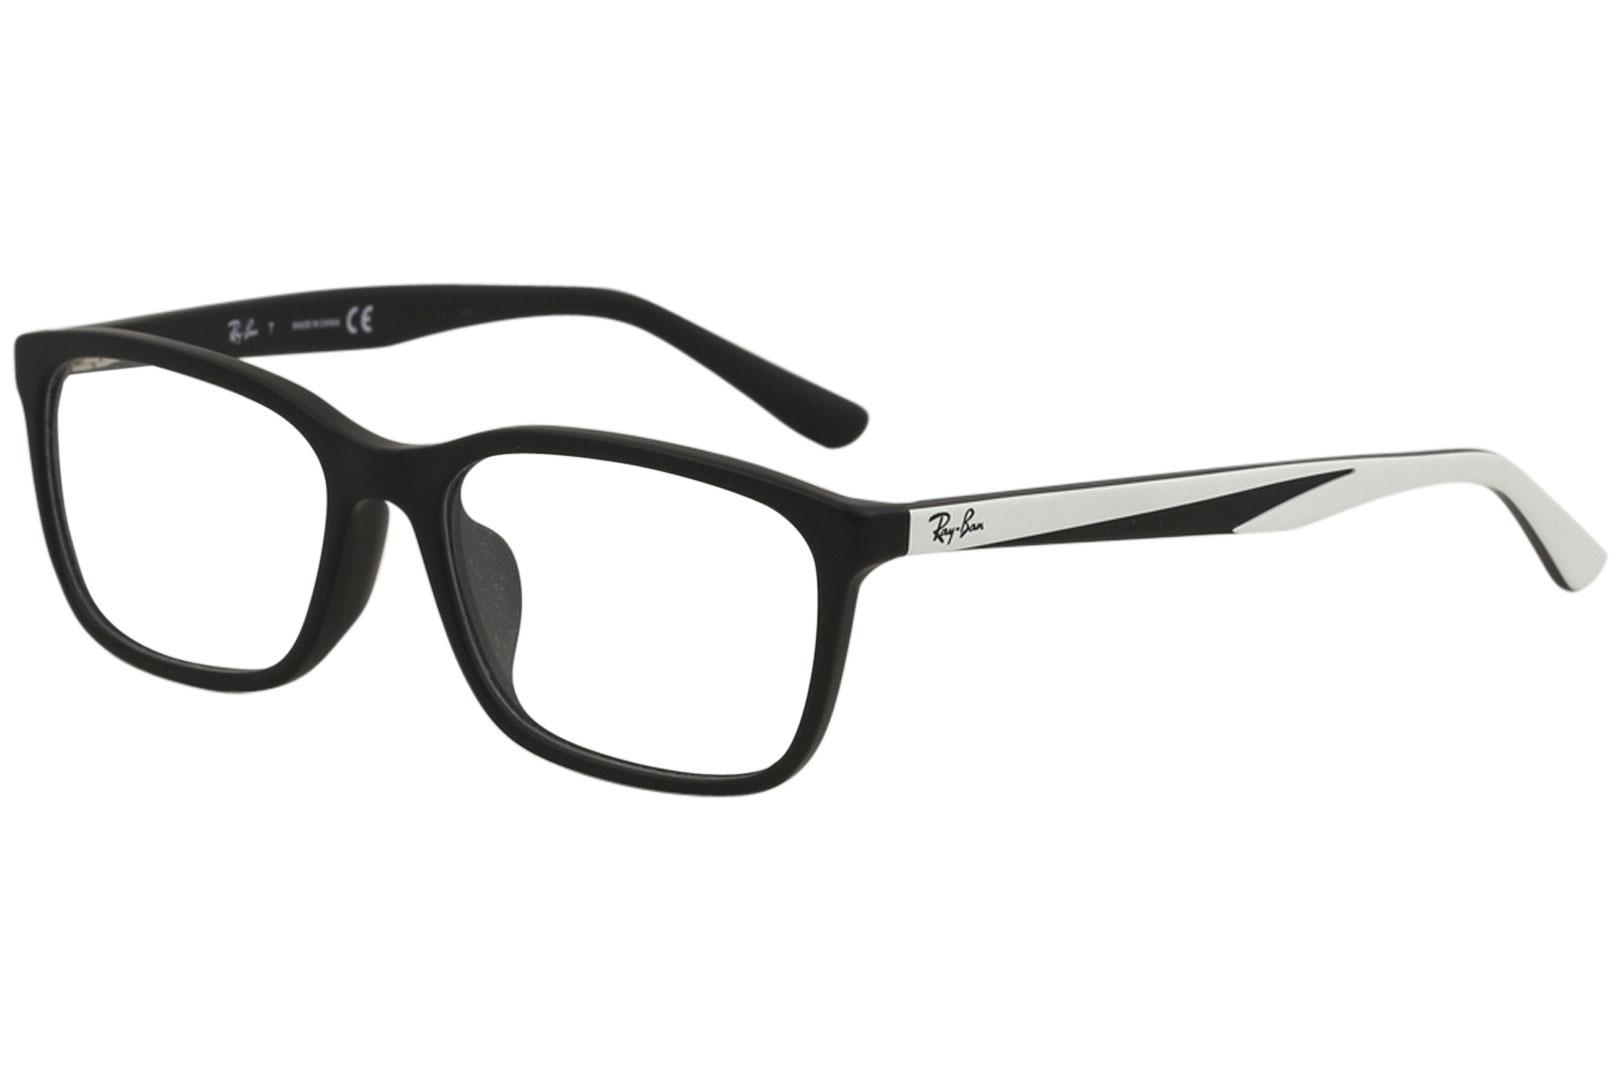 762869c5cc7 Ray Ban Eyeglasses RX5336D RX 5336 D RayBan 5530 Matte Black Optical ...